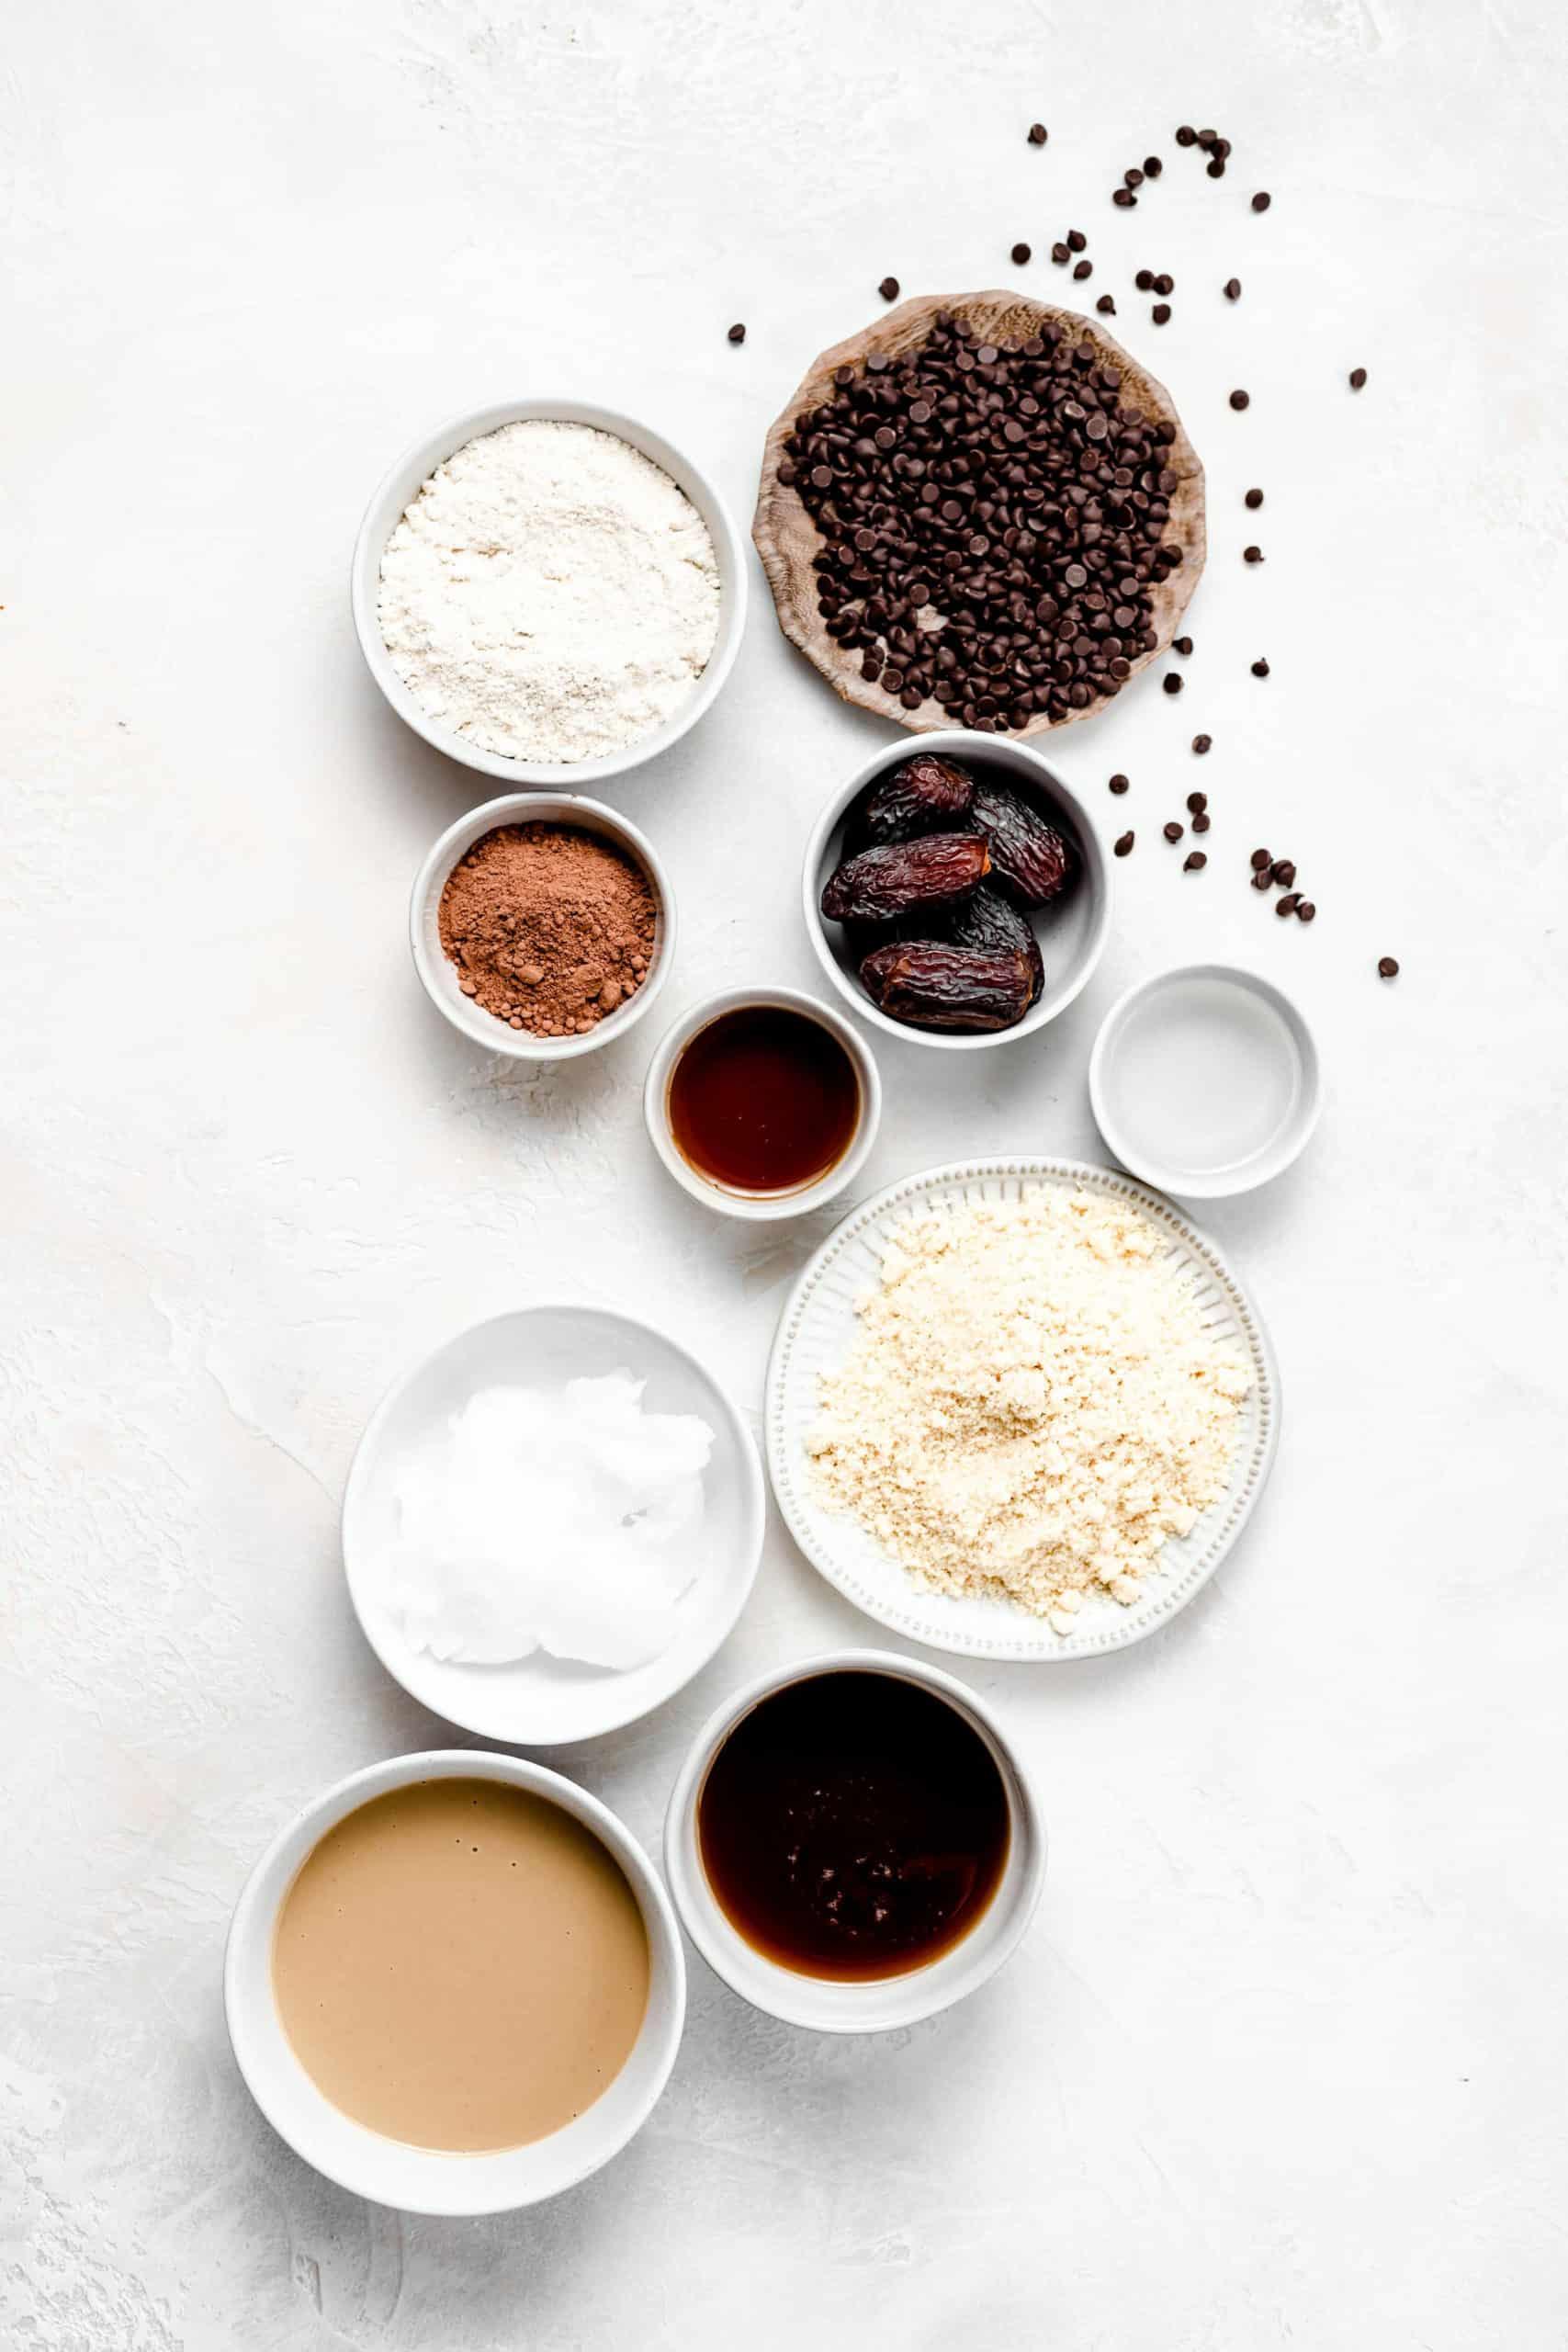 vegan/gluten free chocolate tahini bar ingredients